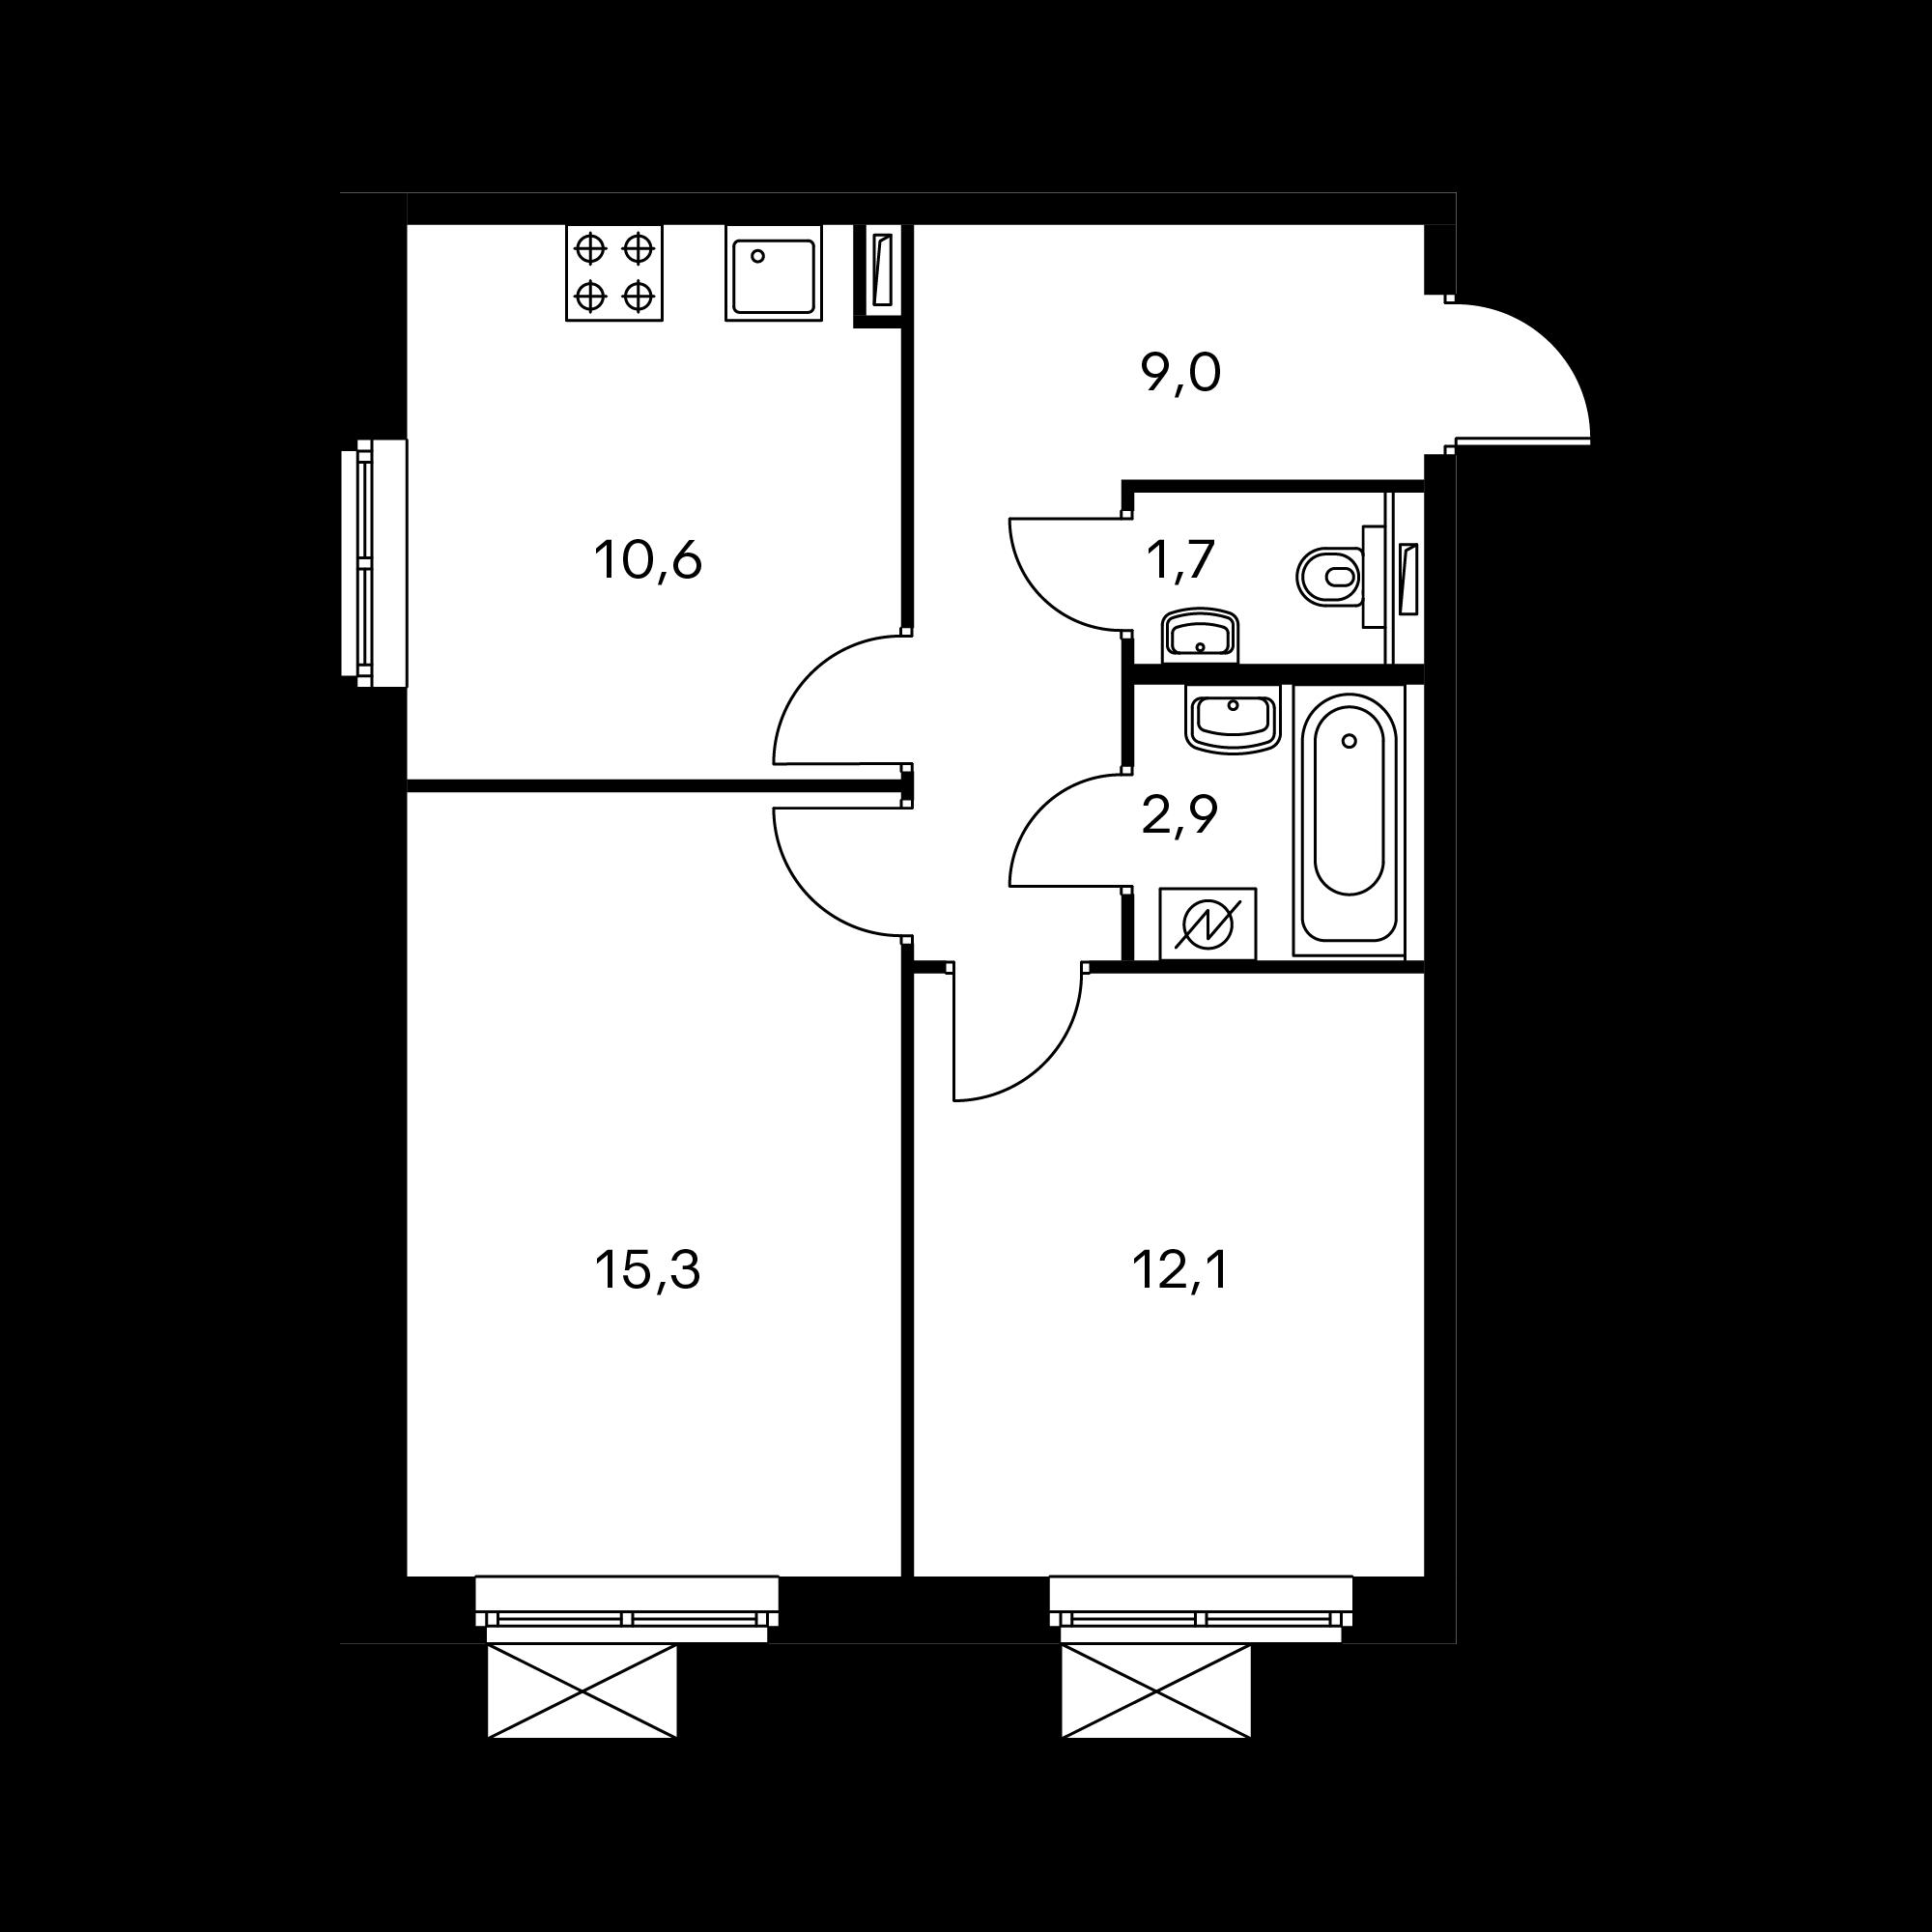 2KS1_6.6-2